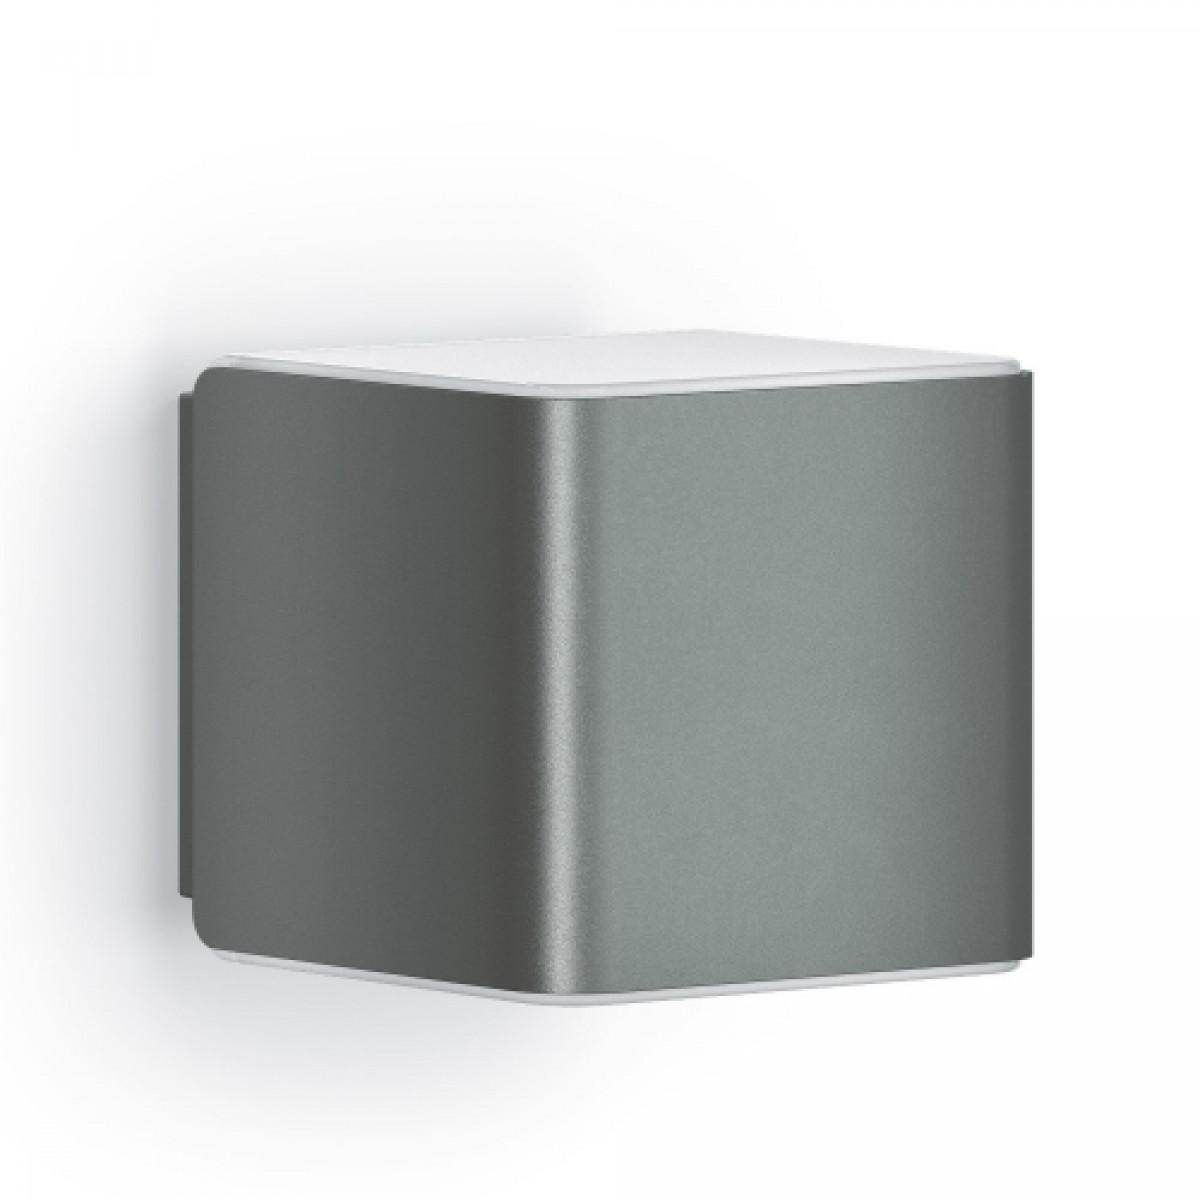 Wandspot Cubo 840 met bewegingsmelder